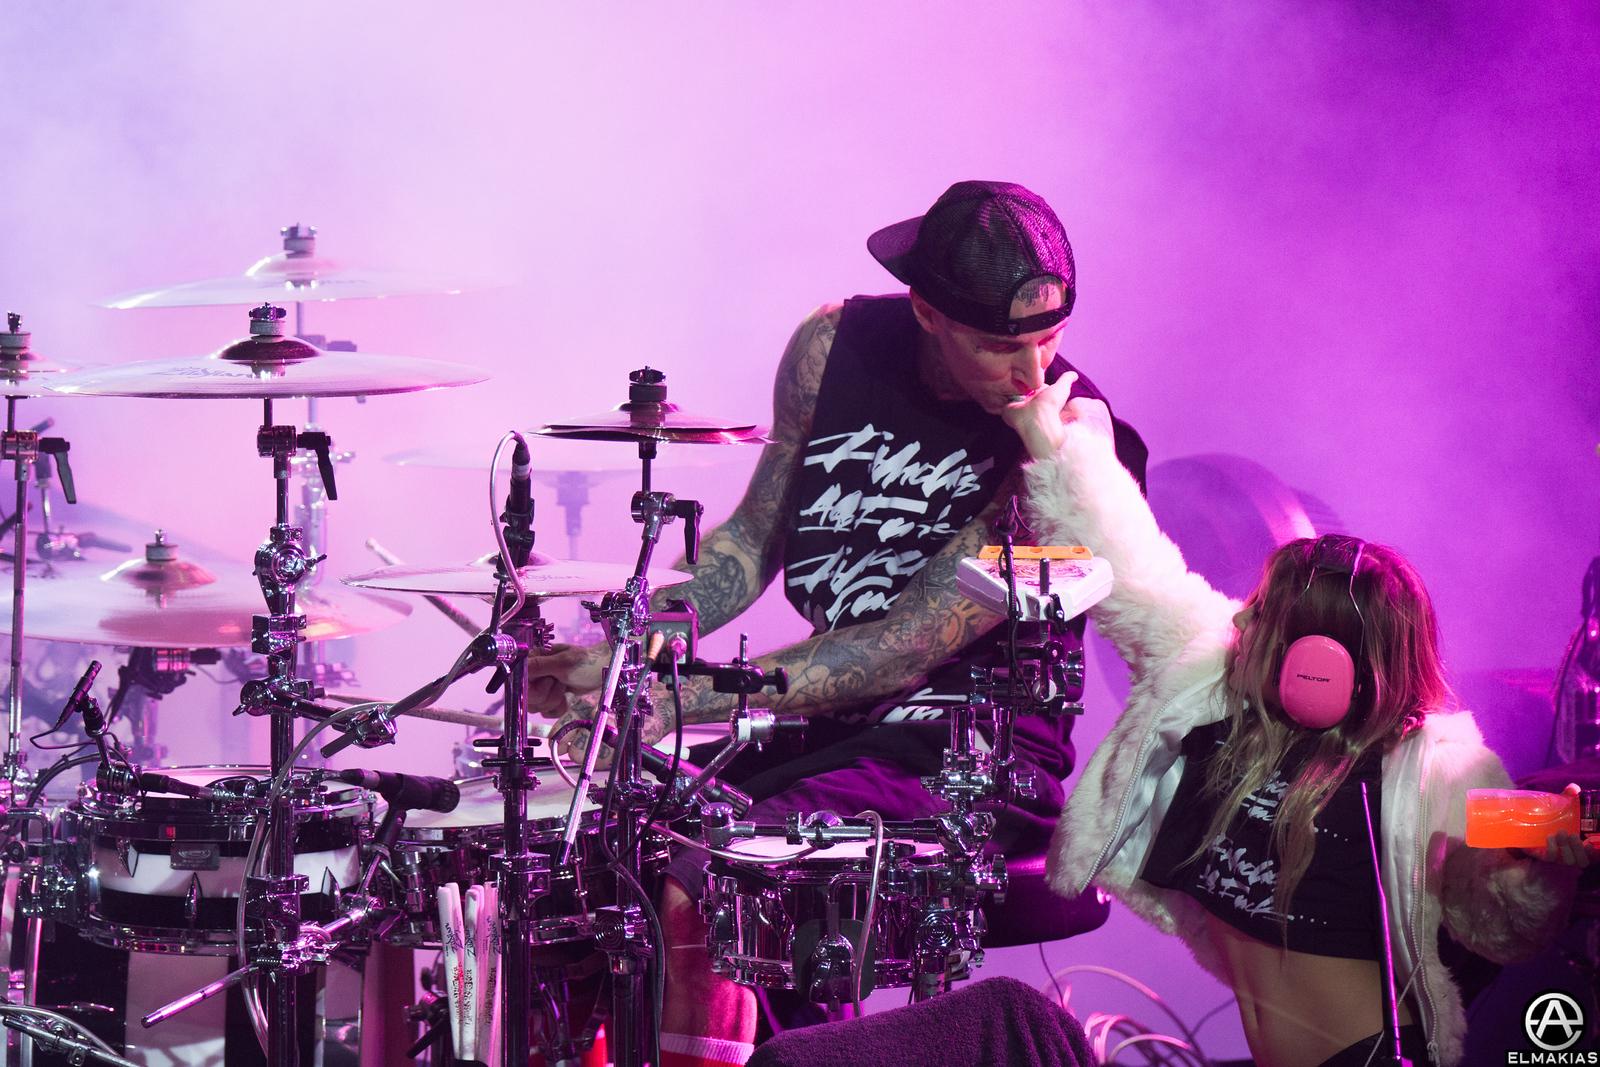 Travis Barker of Blink-182 at Leeds Festival, his daughter giving him some candy, midset